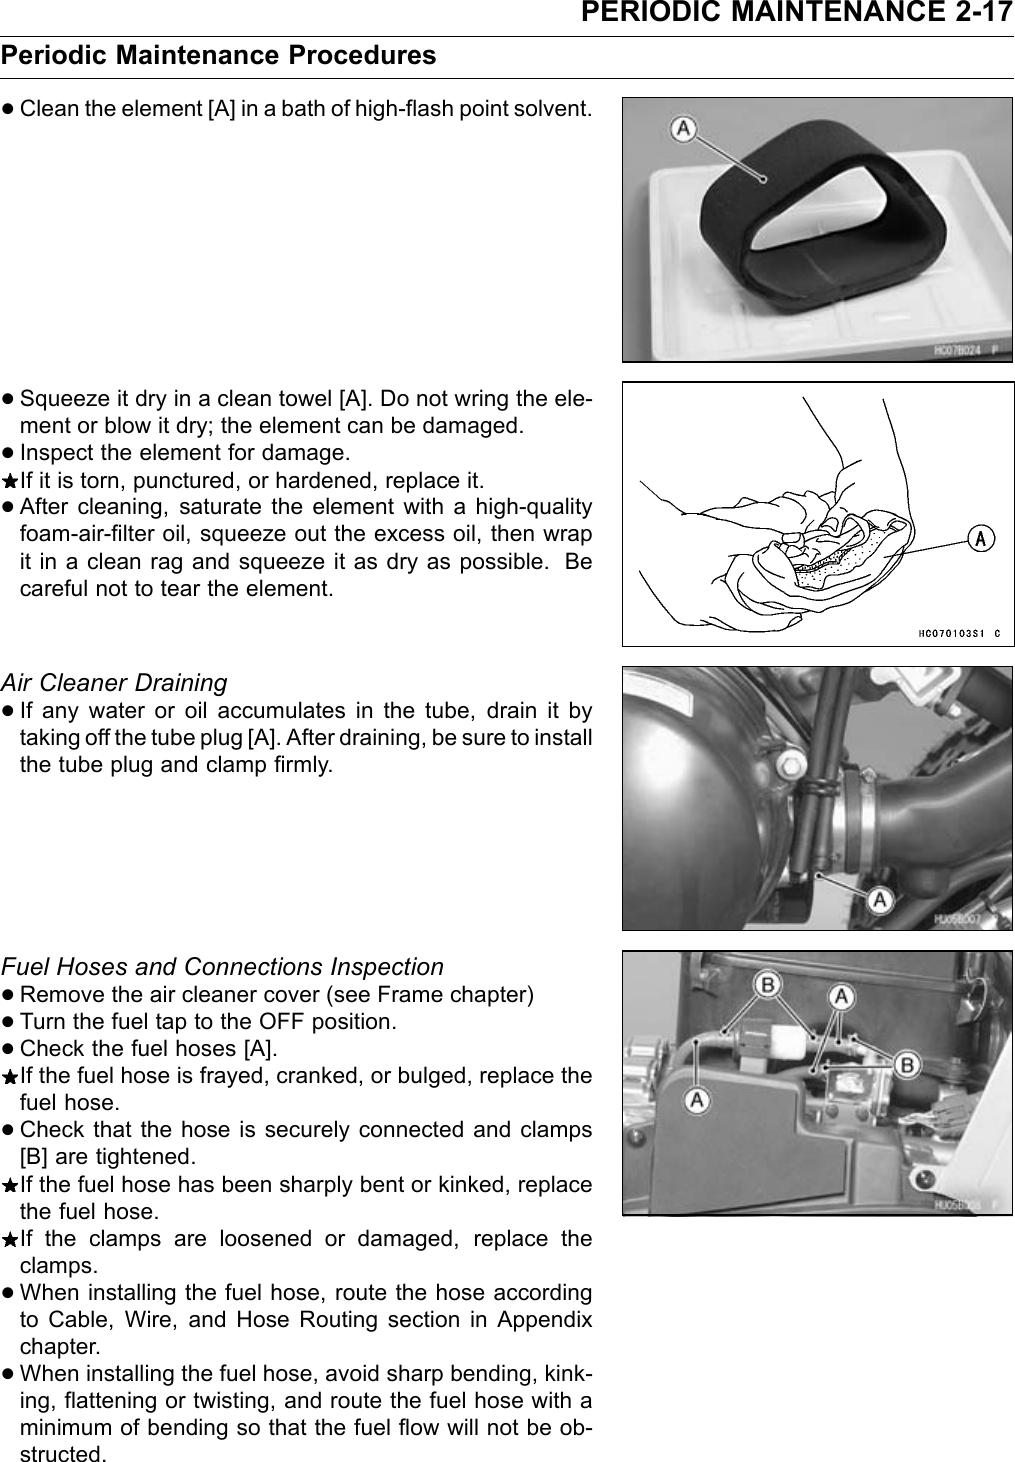 Wiring Diagram Further Kfx 700 Wiring Diagram On Ds 90 Wiring Diagram